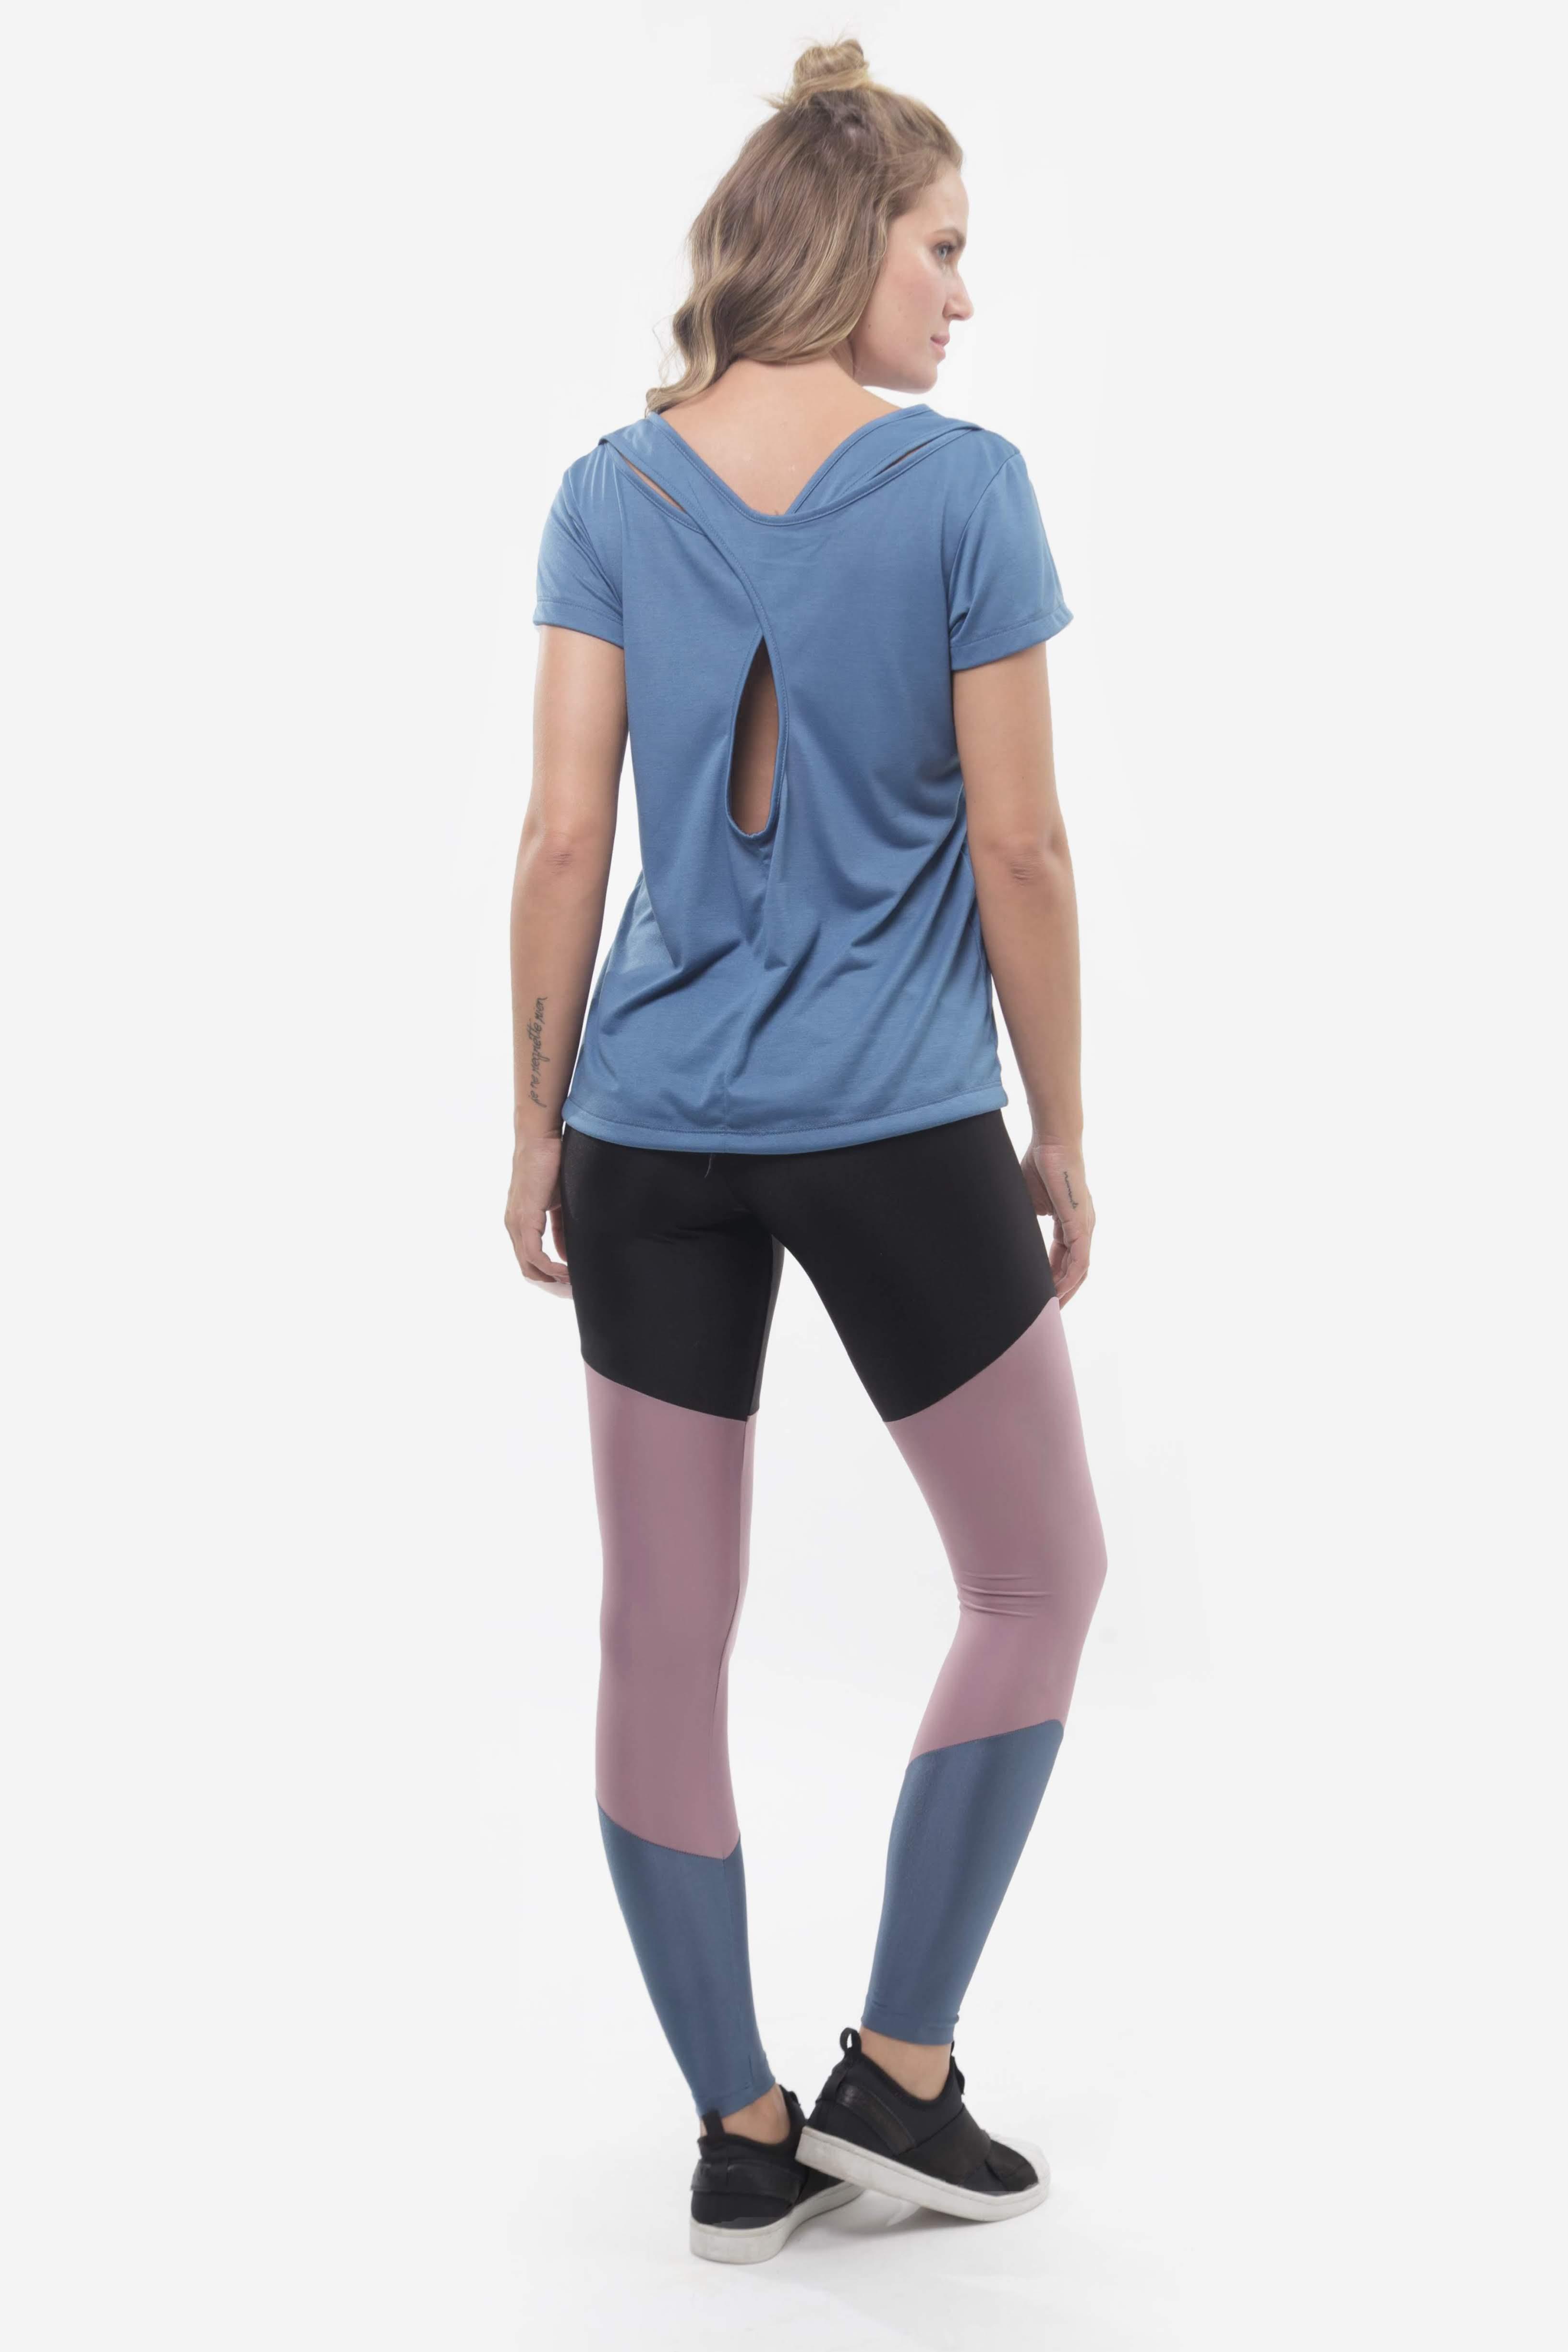 Tshirt Noronha e Legging Melrose